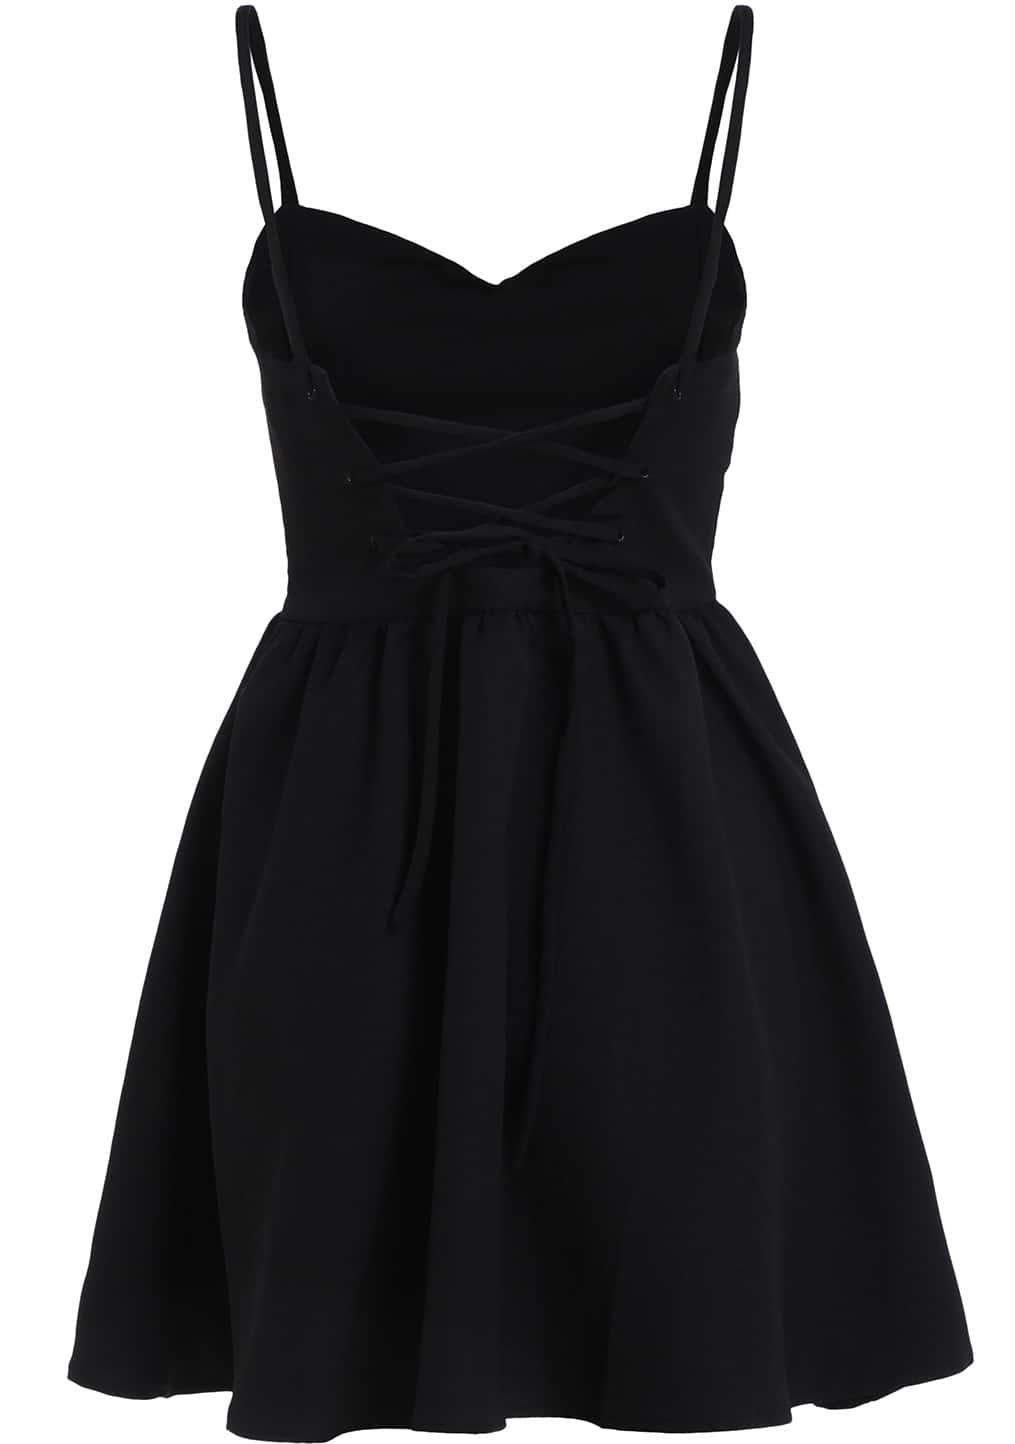 Black Spaghetti Strap Backless Flare Dress Shein Sheinside